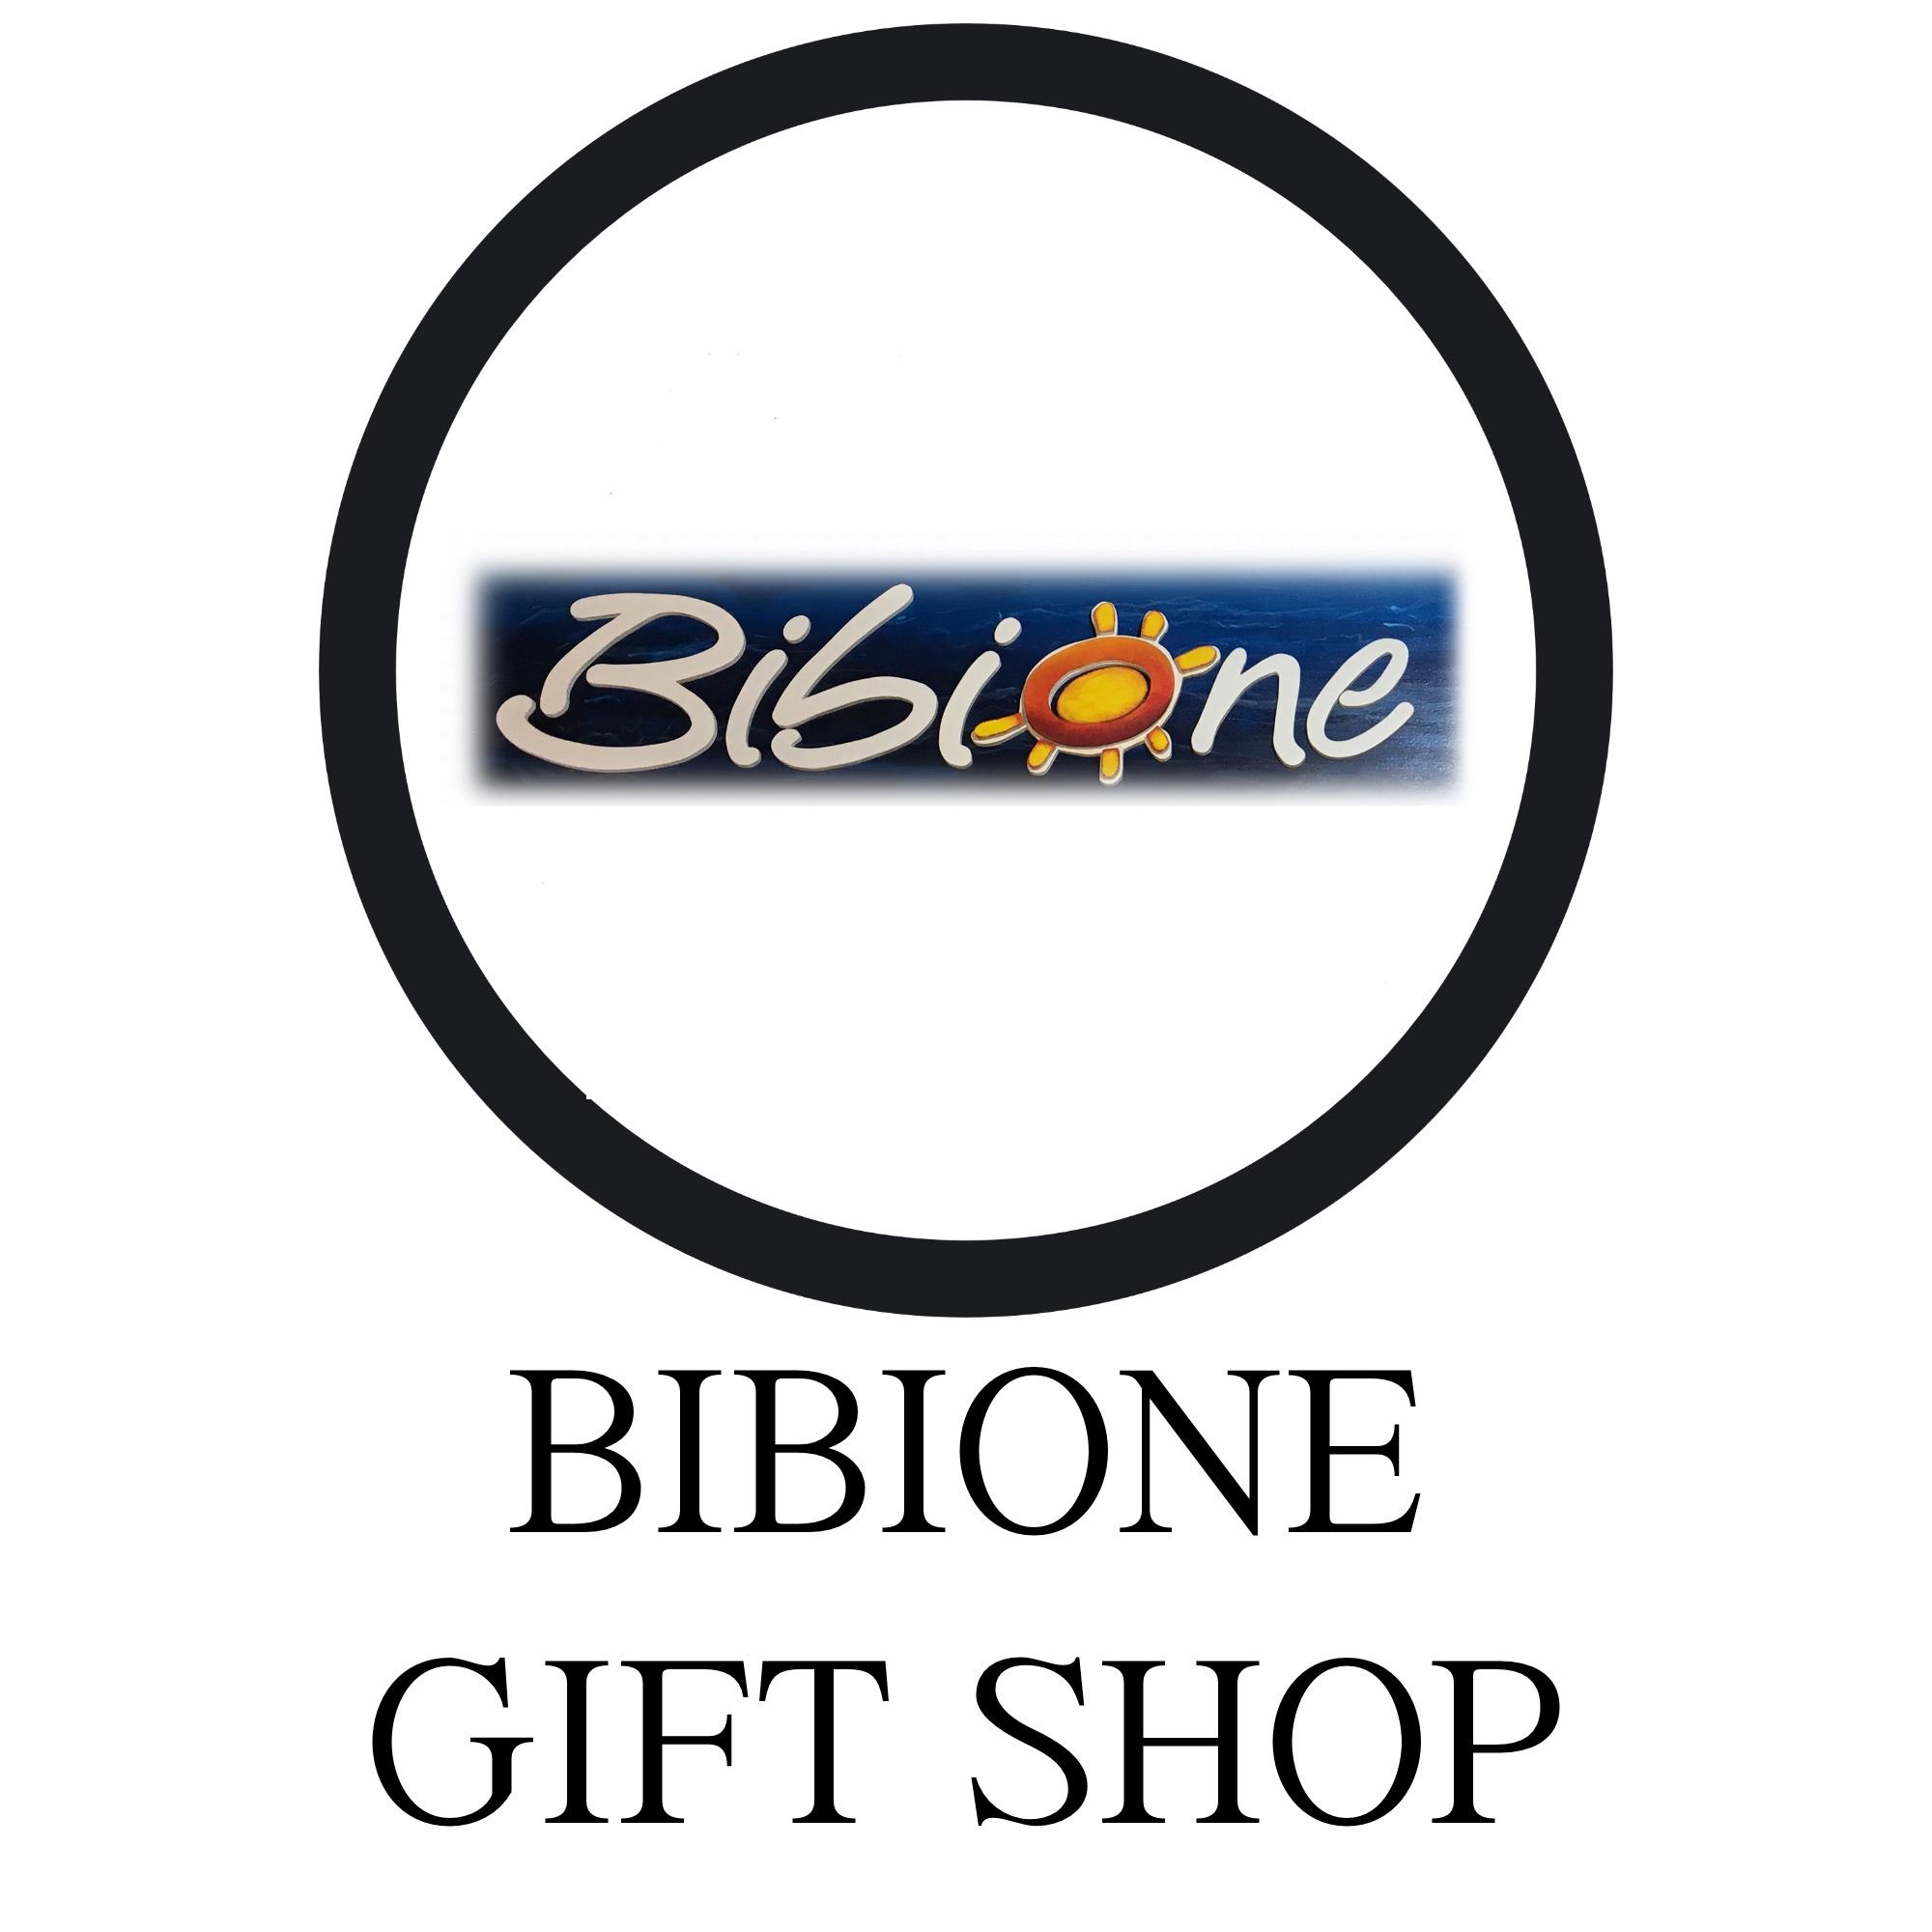 Bibione Gift